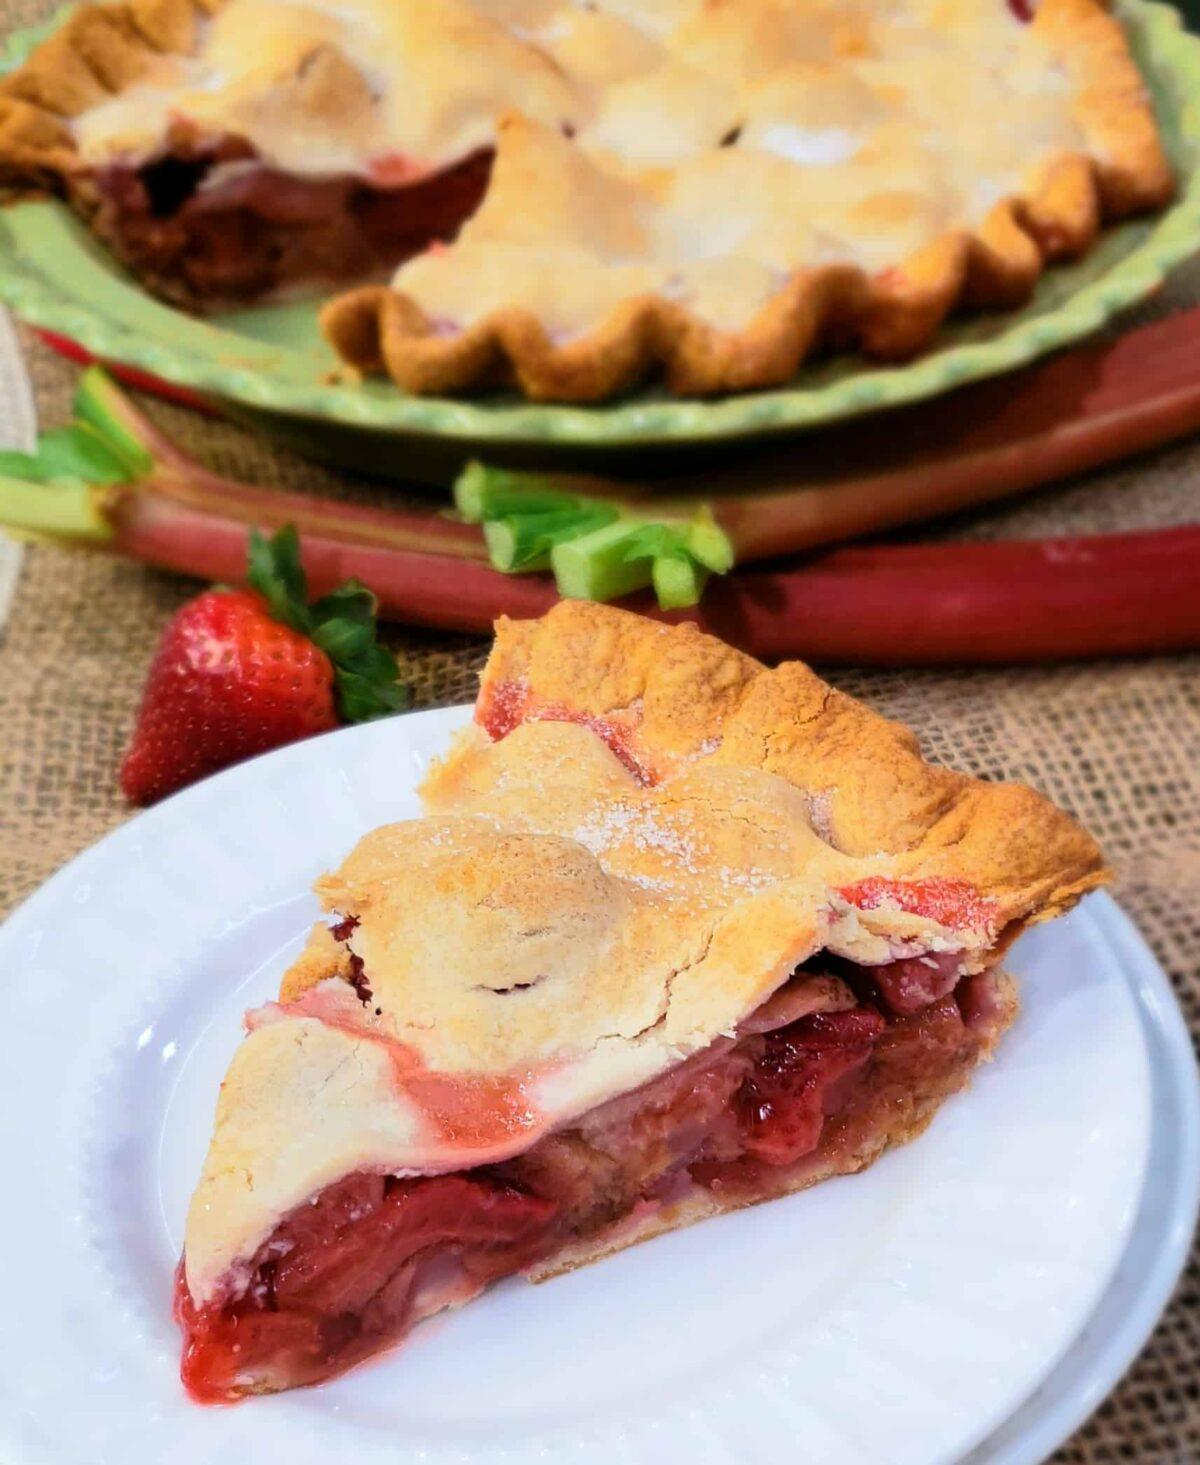 Shortcut Strawberry Rhubarb Pie sliced on a white plate